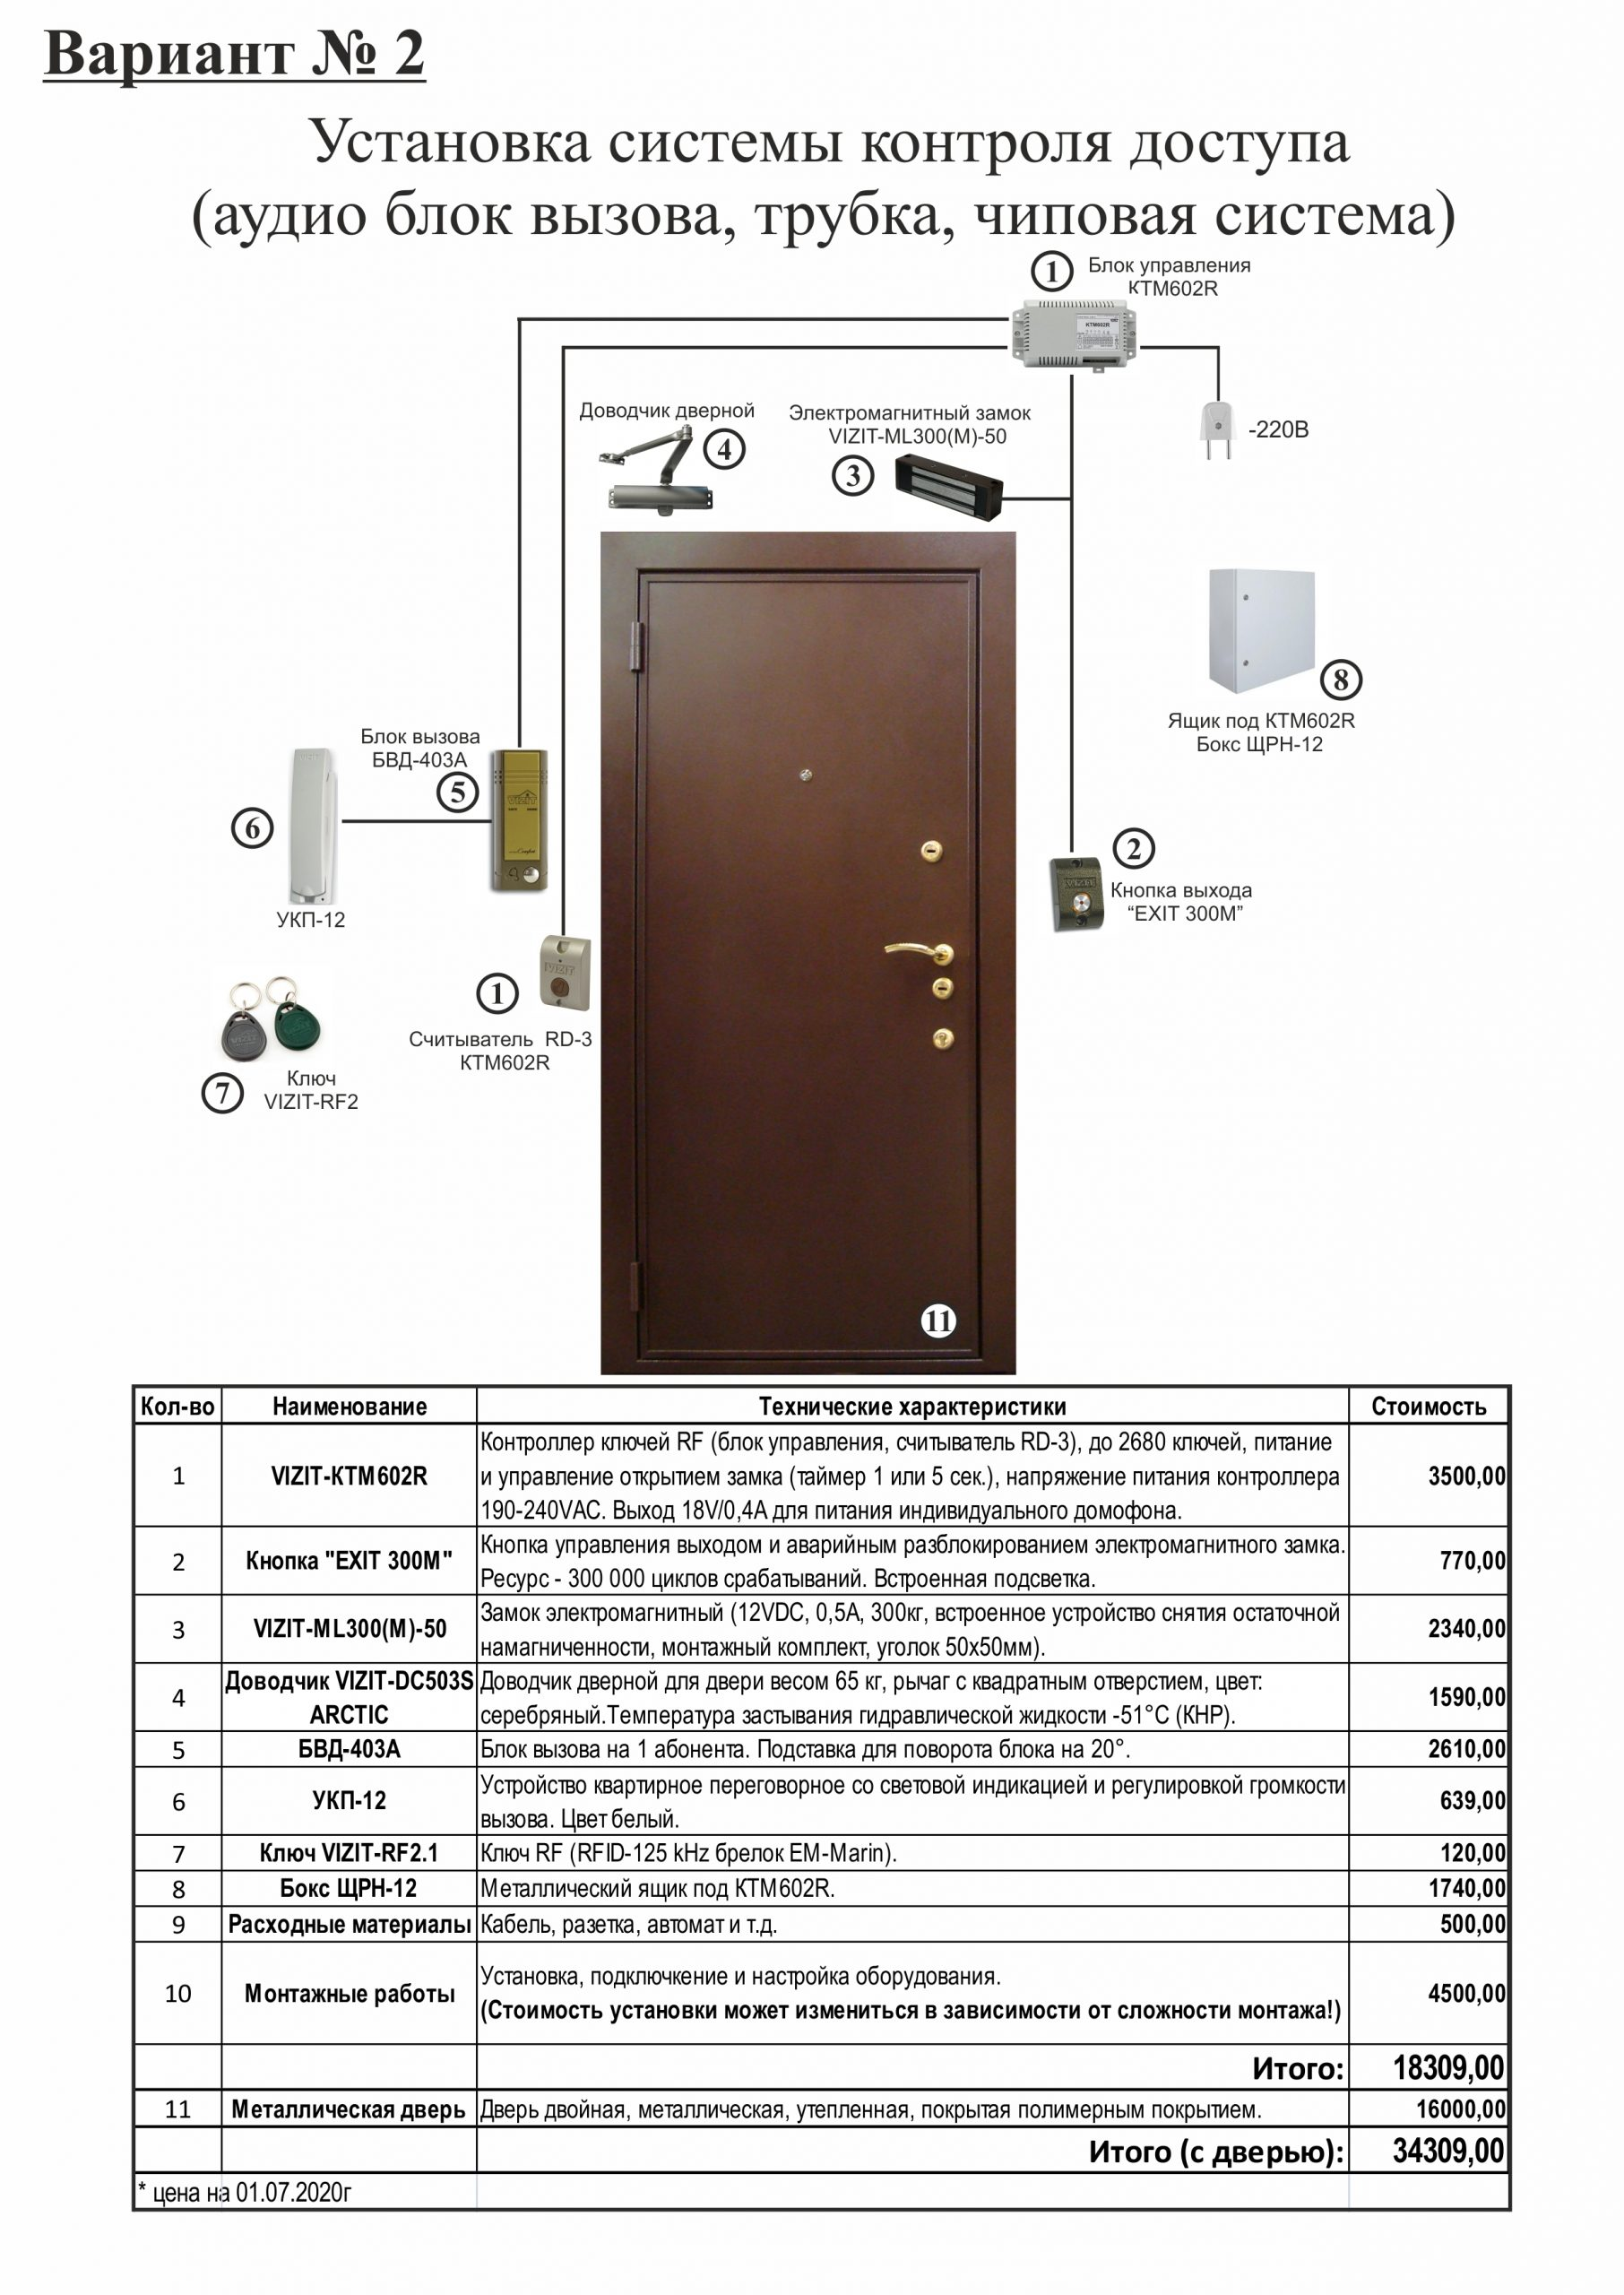 Установка КТМ602R, БВД-403А и УКП-12